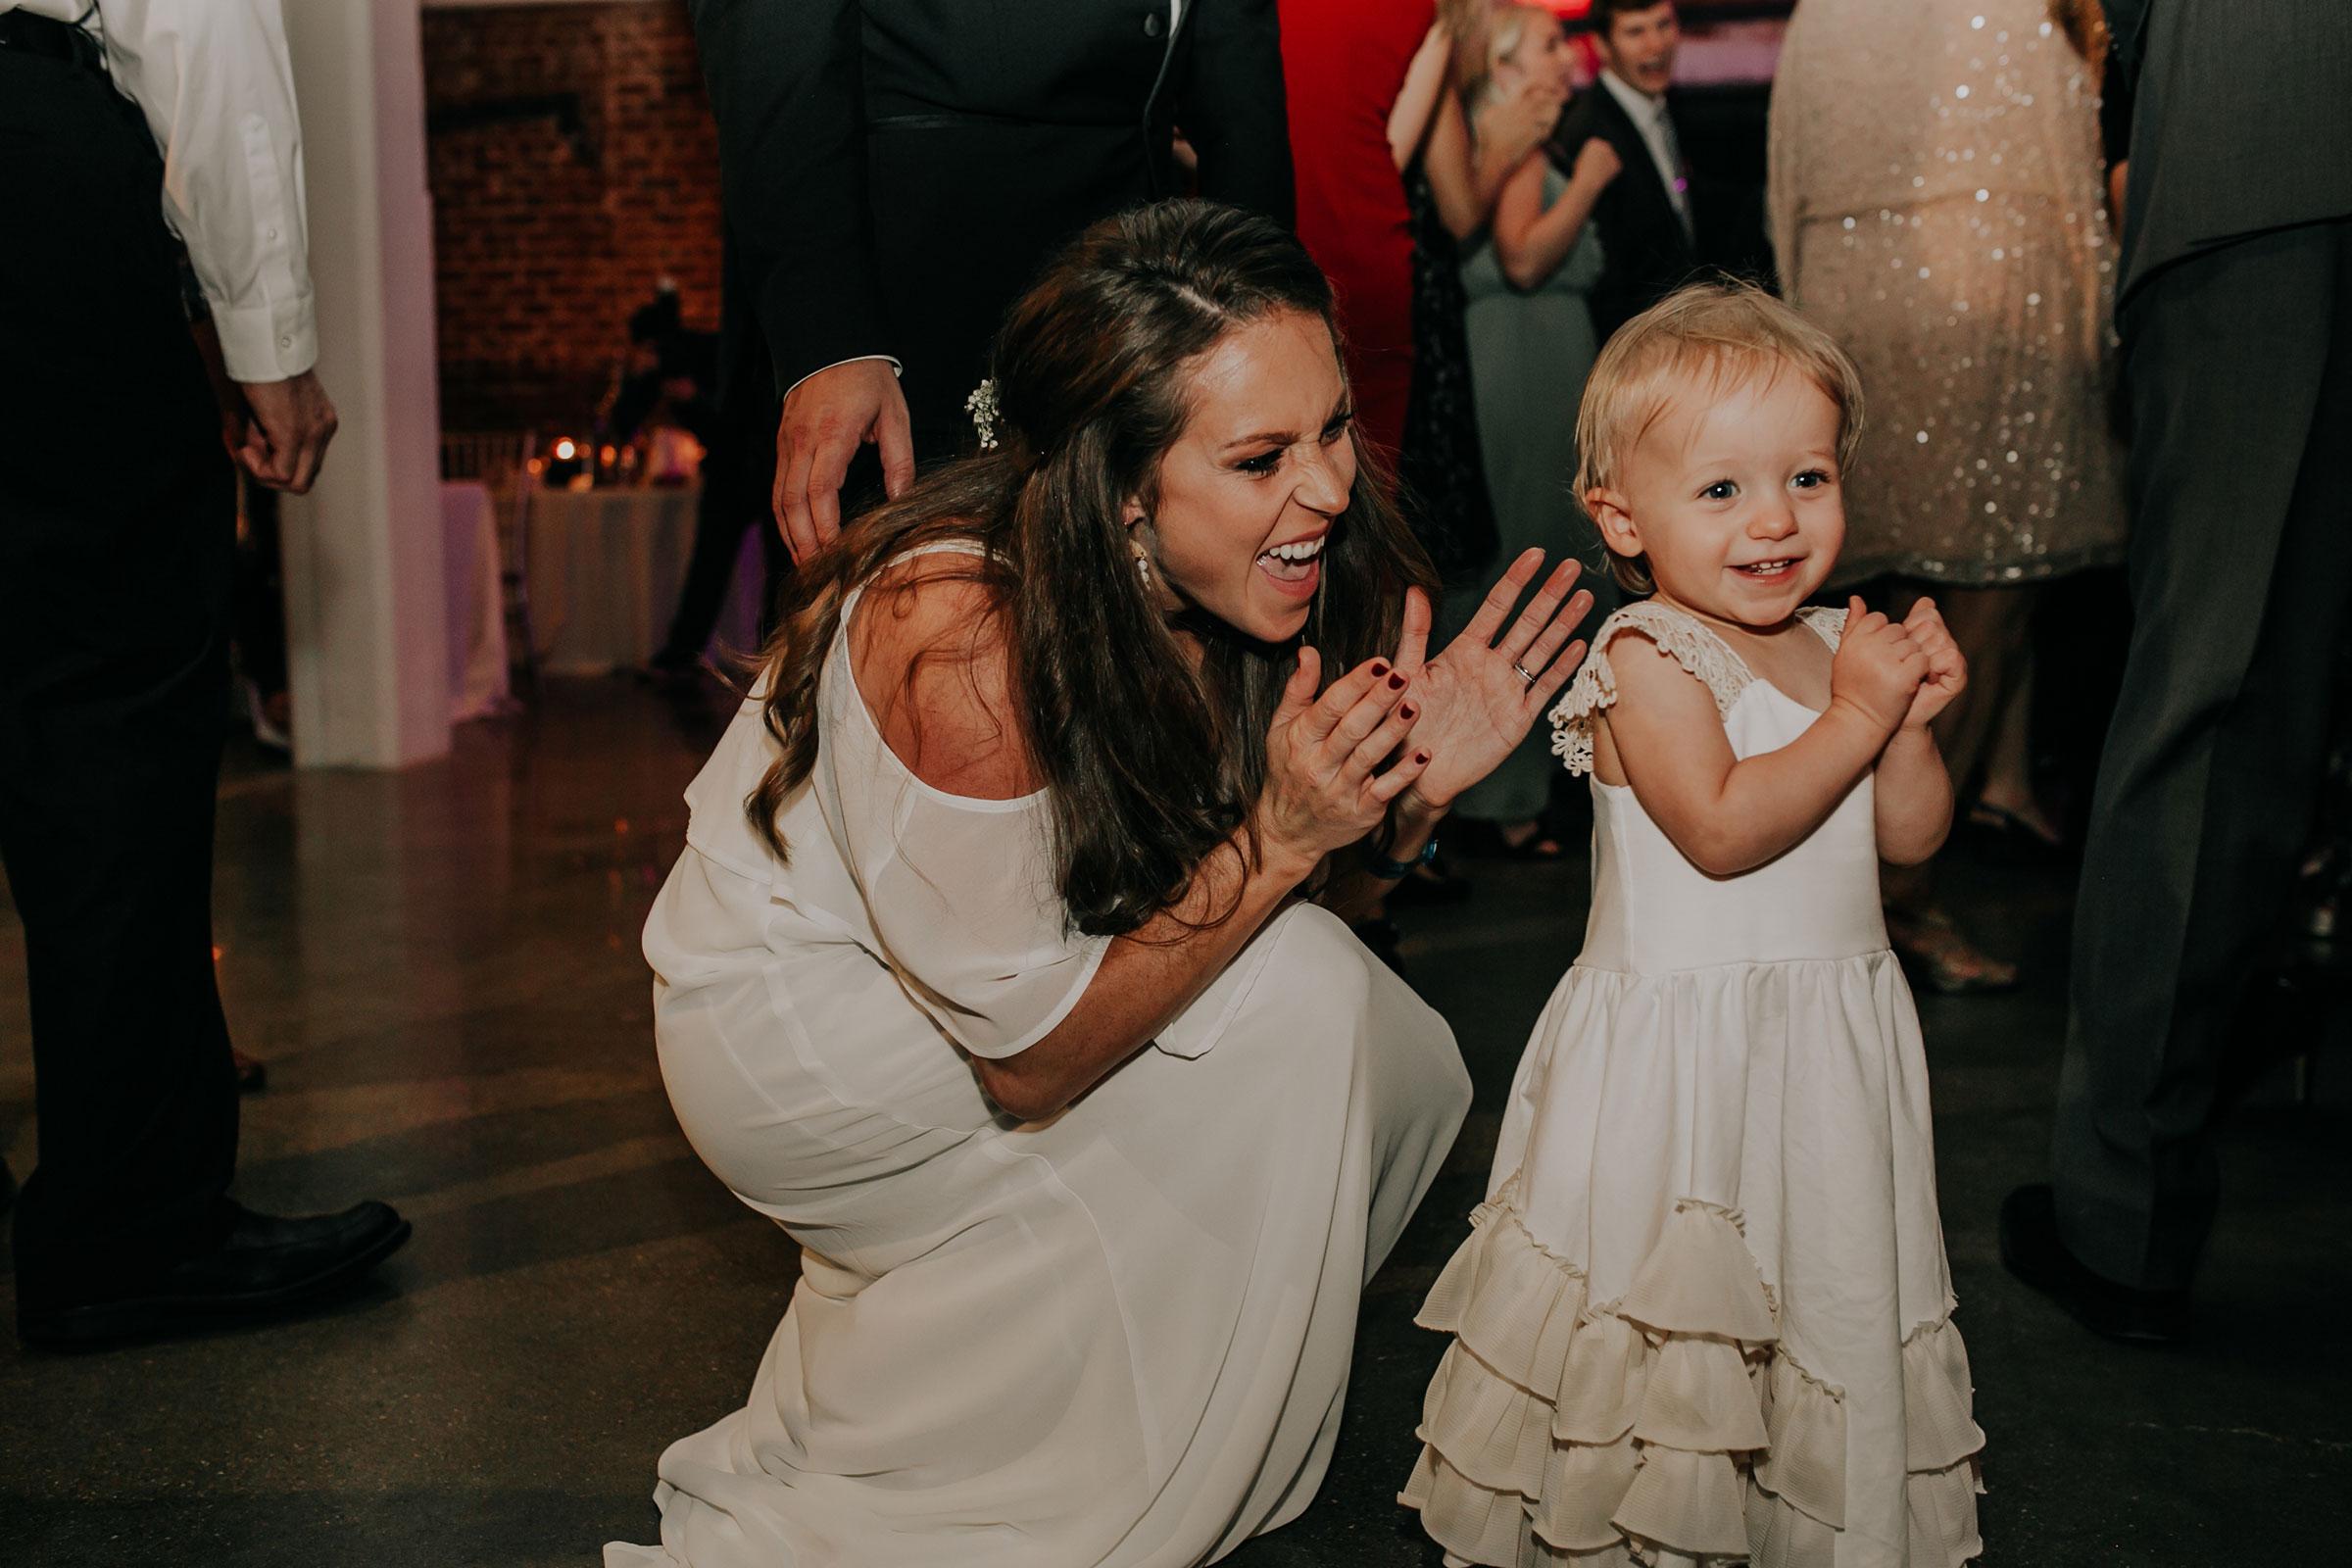 bridesmaid-and-daughter-dancing-founders-one-nine-omaha-nebraska-raelyn-ramey-photography.jpg